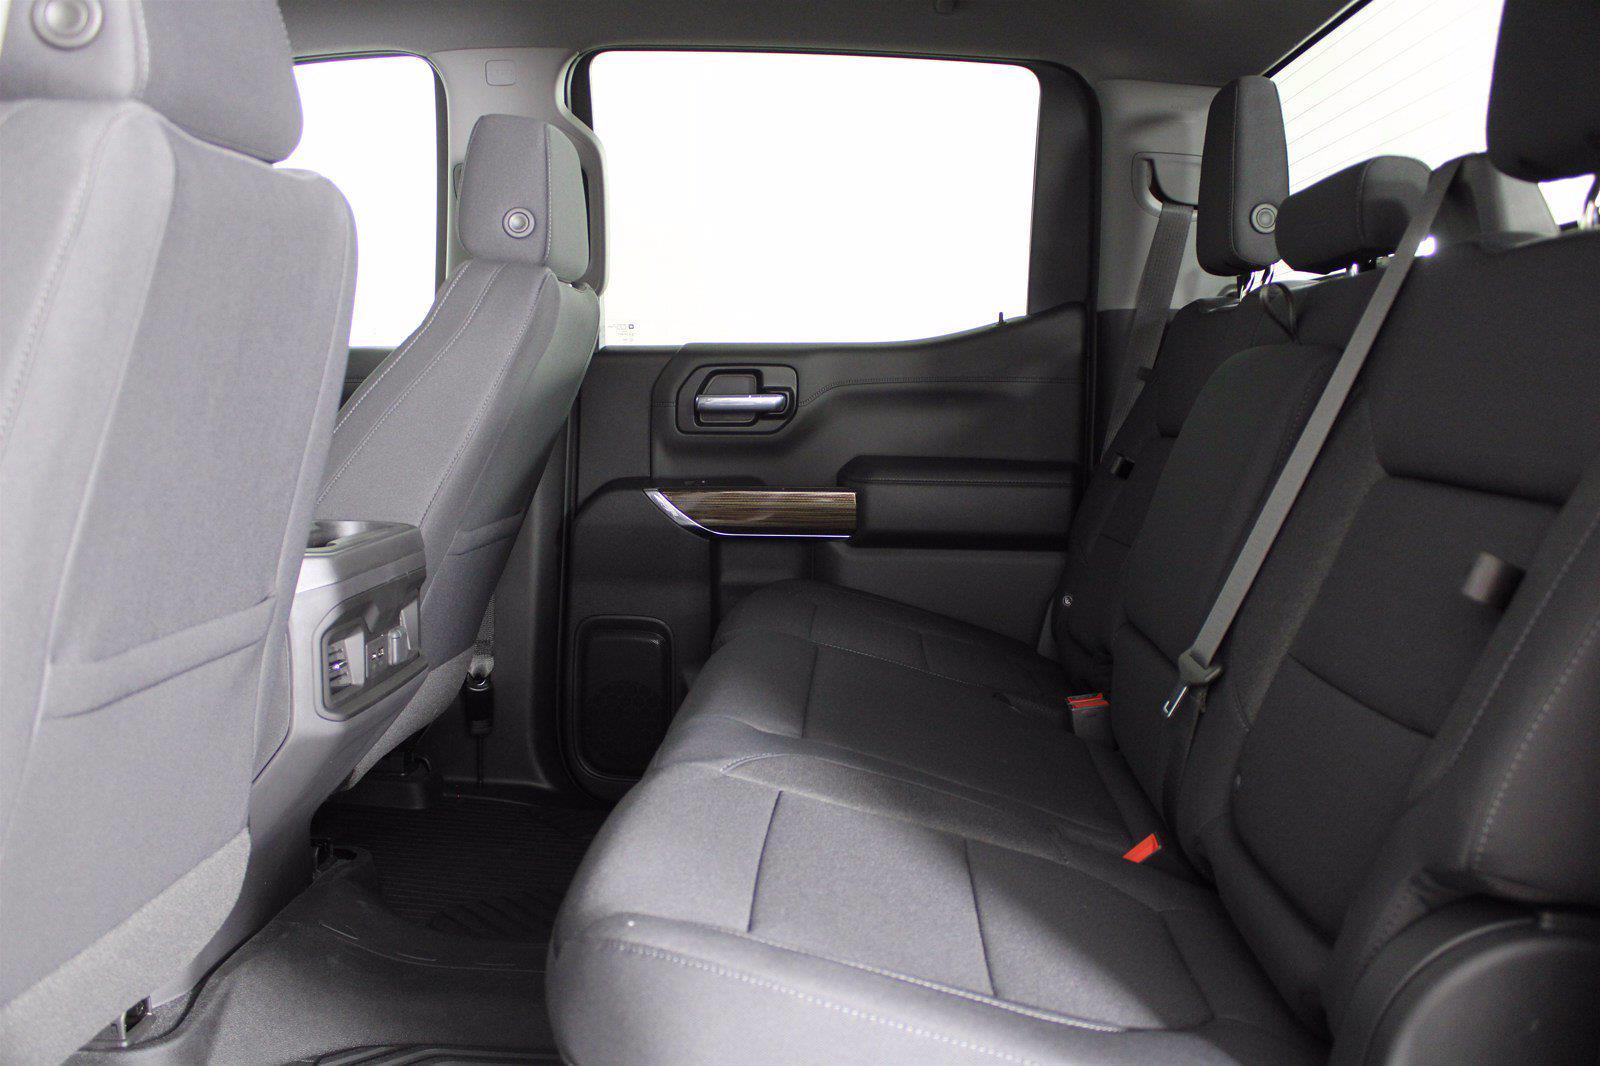 2021 Chevrolet Silverado 1500 Crew Cab 4x4, Pickup #D111109 - photo 16